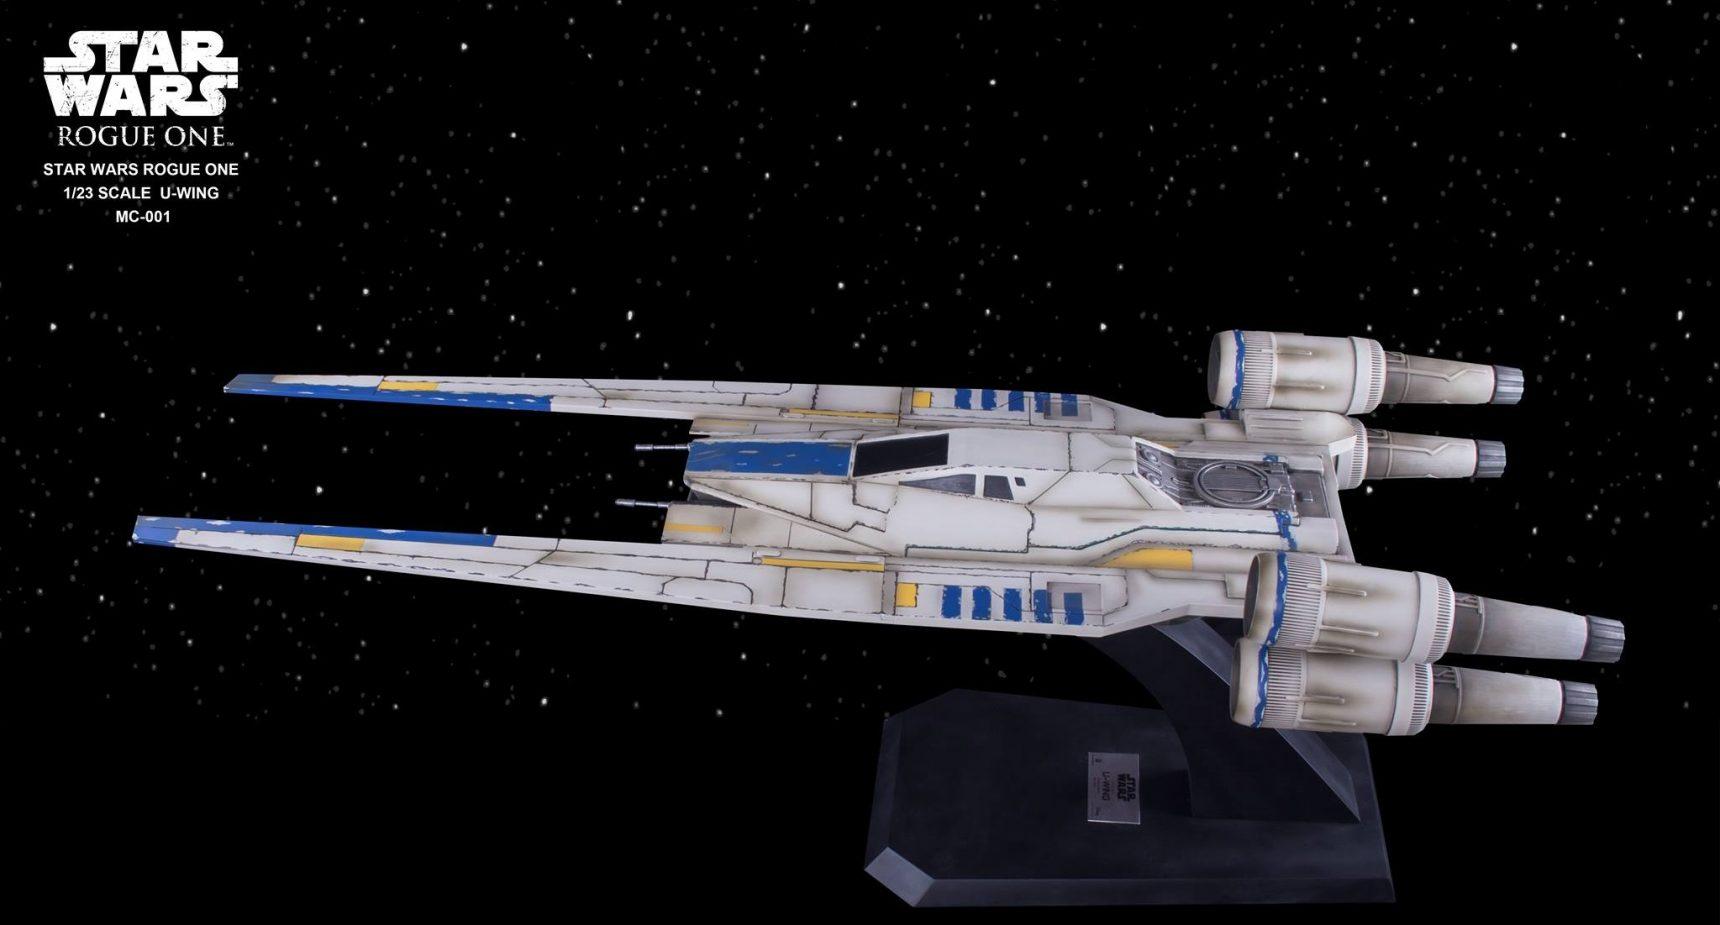 Riesiger Beast Kingdom U-Wing Starfighter vorgestellt